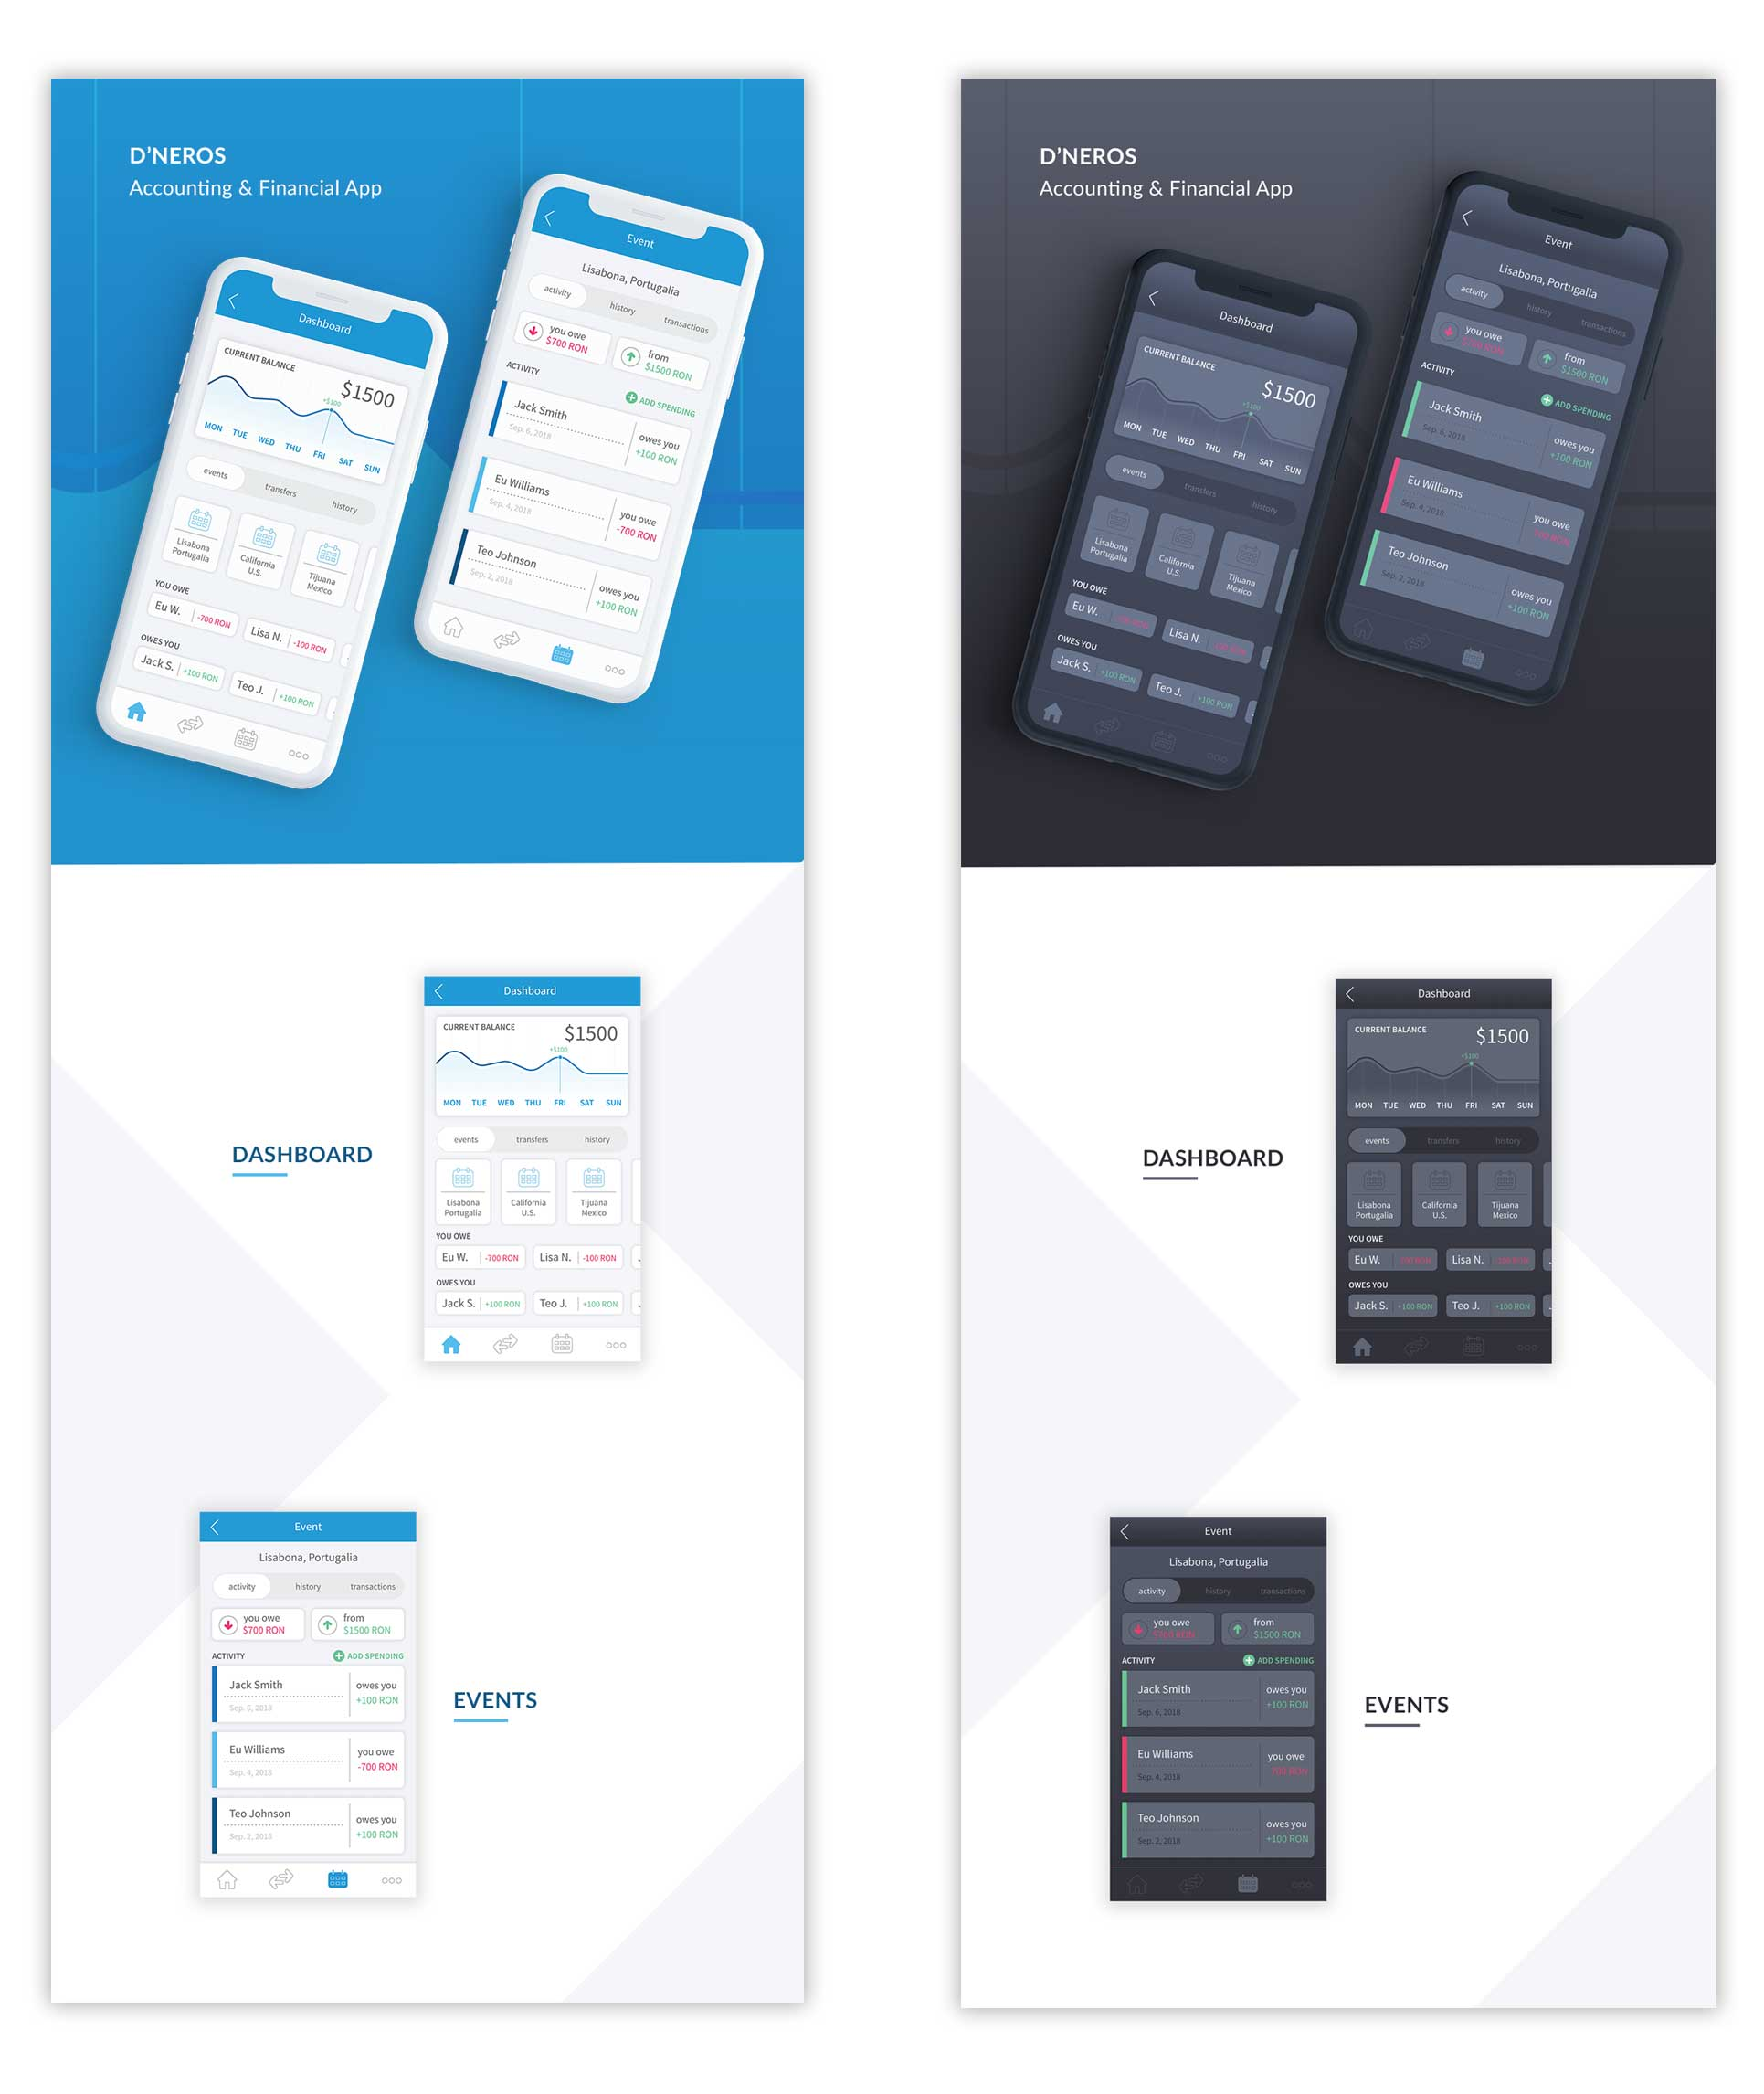 D'neros App Layout Image